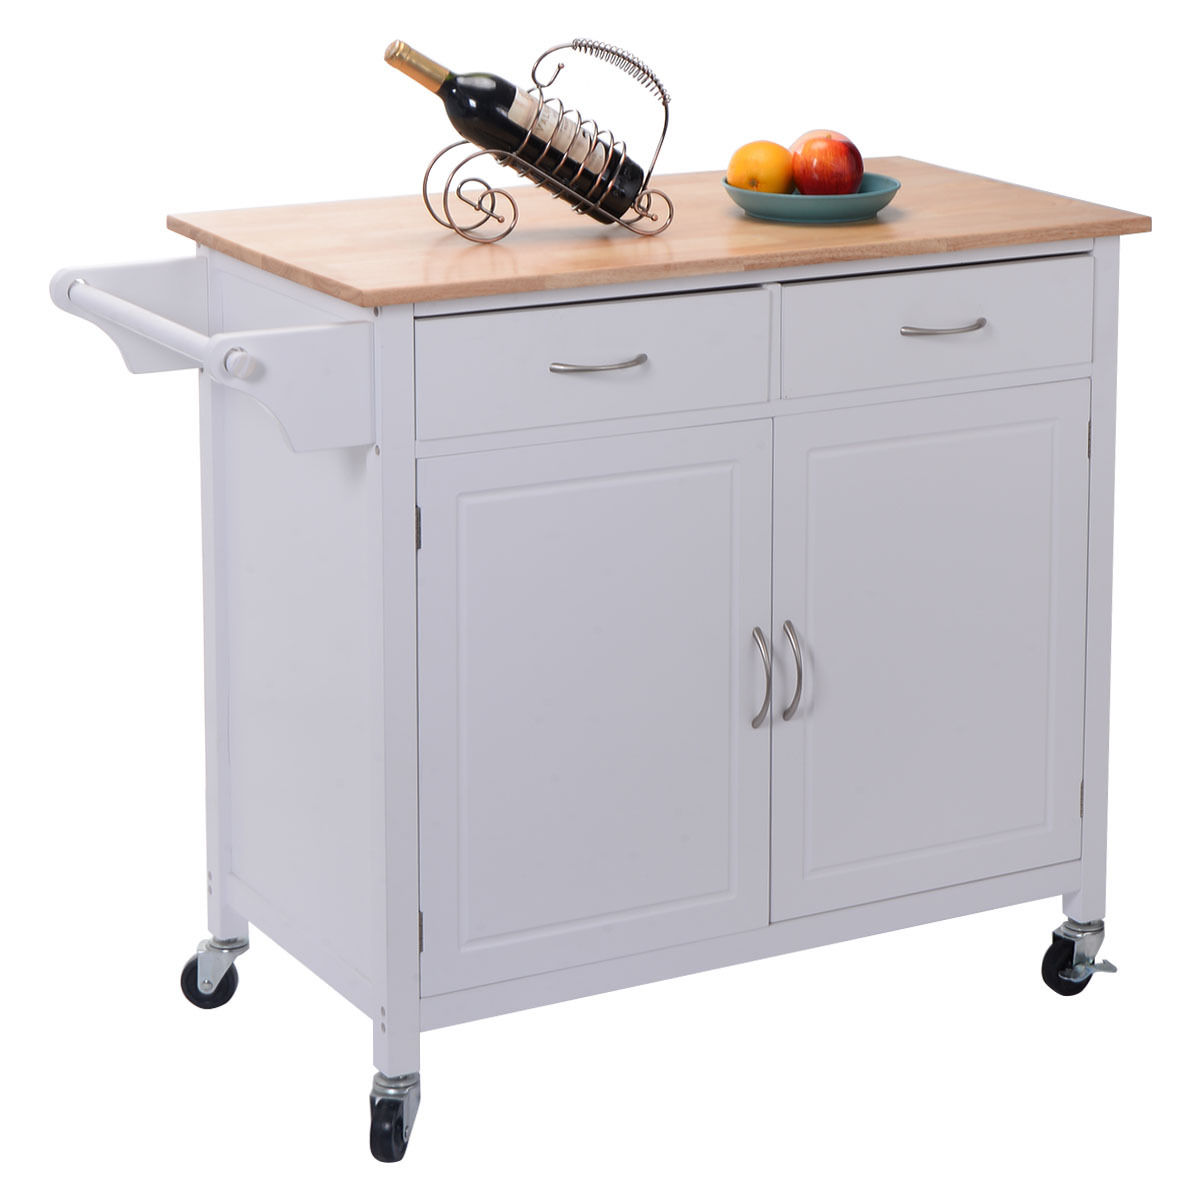 kitchen cart $150 - $200 HAJTOFB